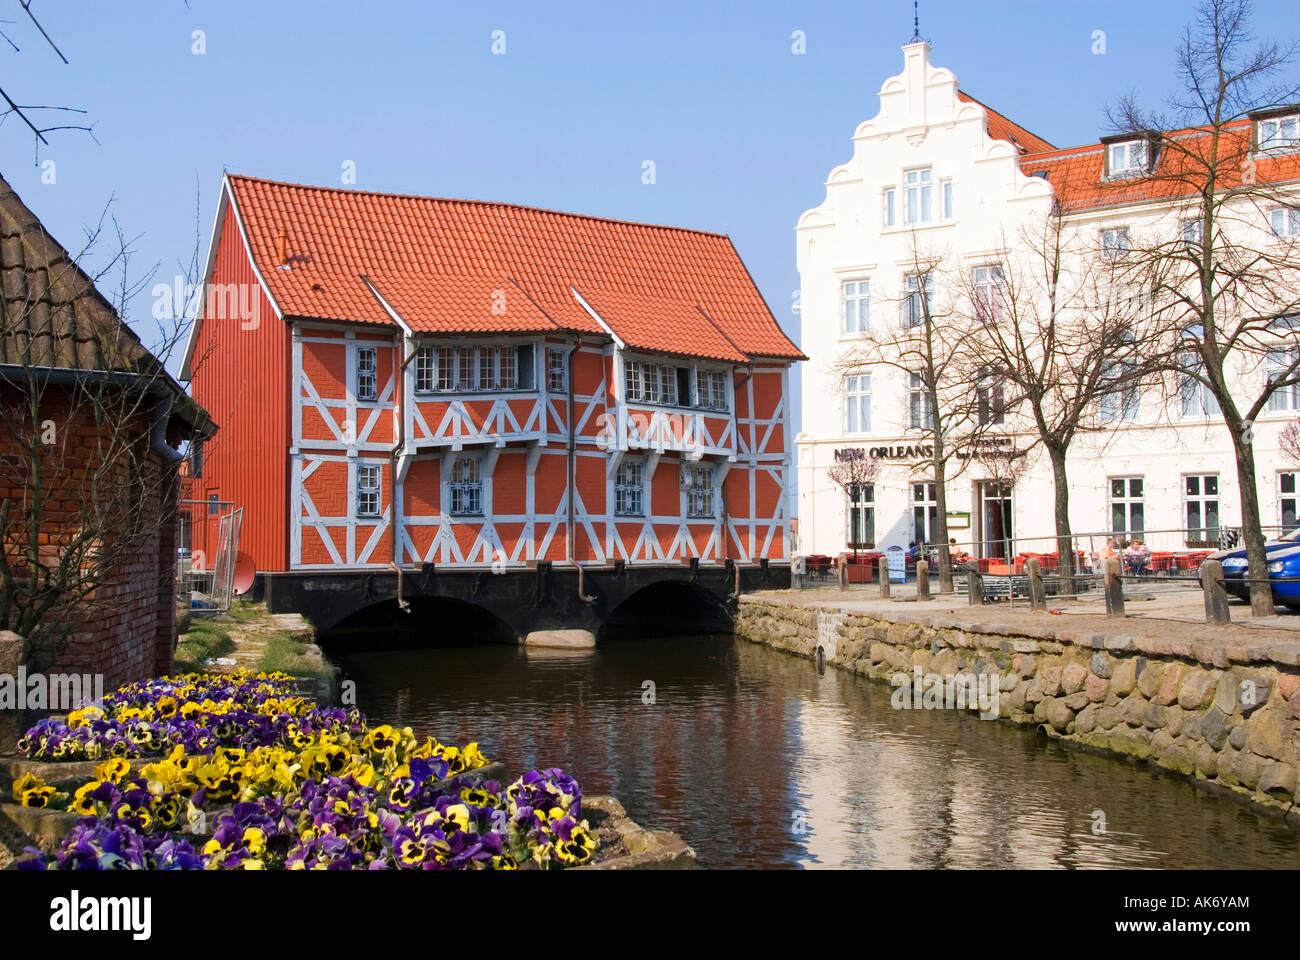 Lohberg / Wismar - Stock Image